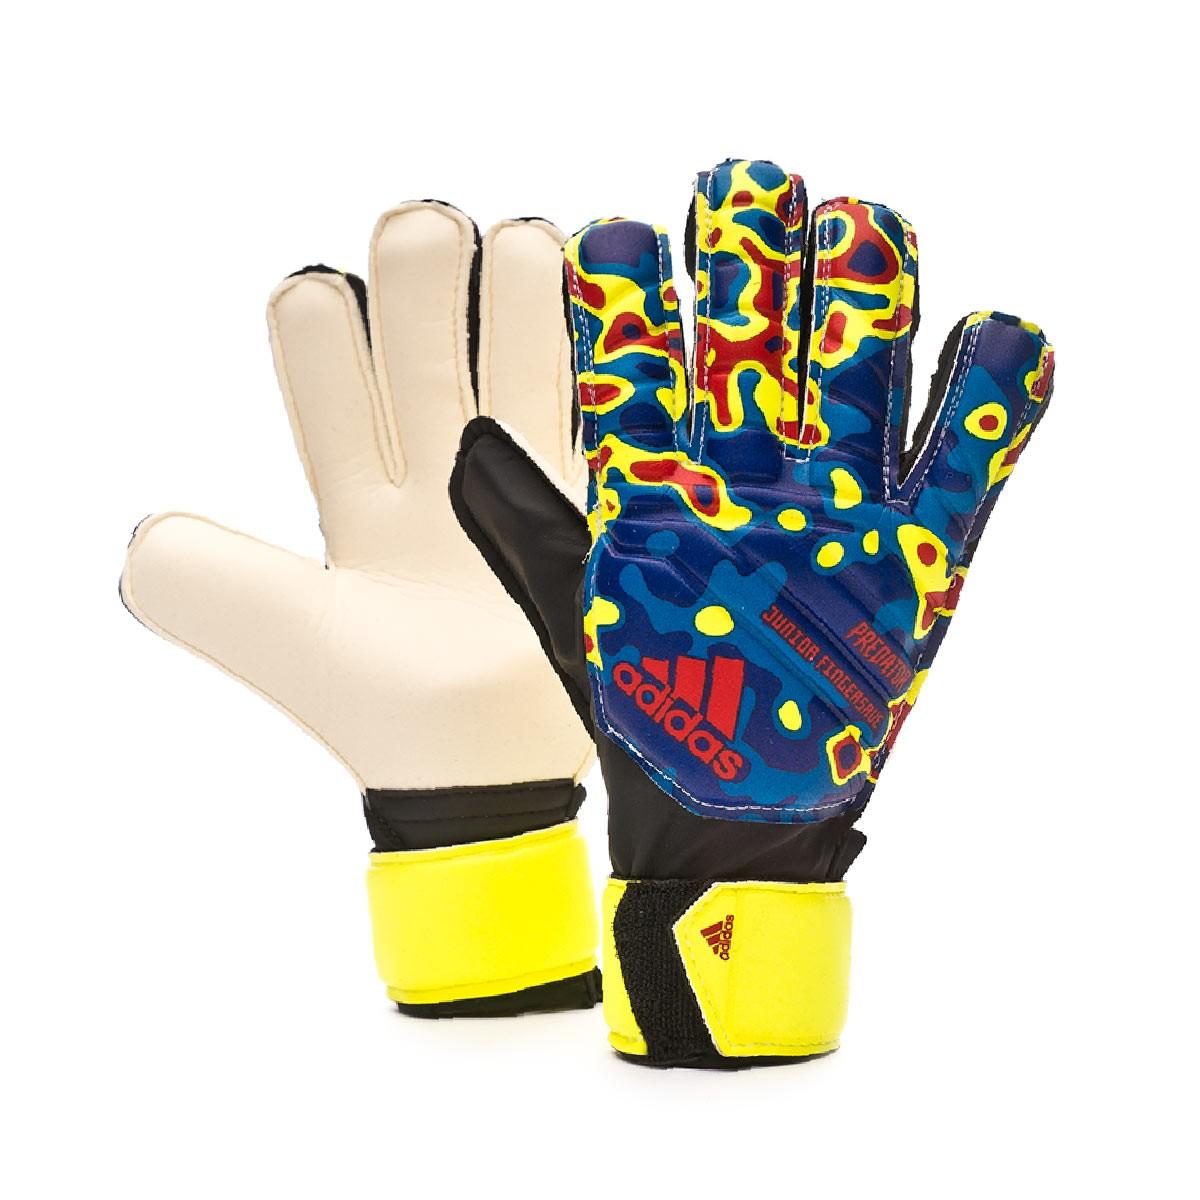 low priced 192b9 ec758 Glove adidas Predator Junior Fingensave MN Niño Solar yellow-Football blue-Active  red - Tienda de fútbol Fútbol Emotion